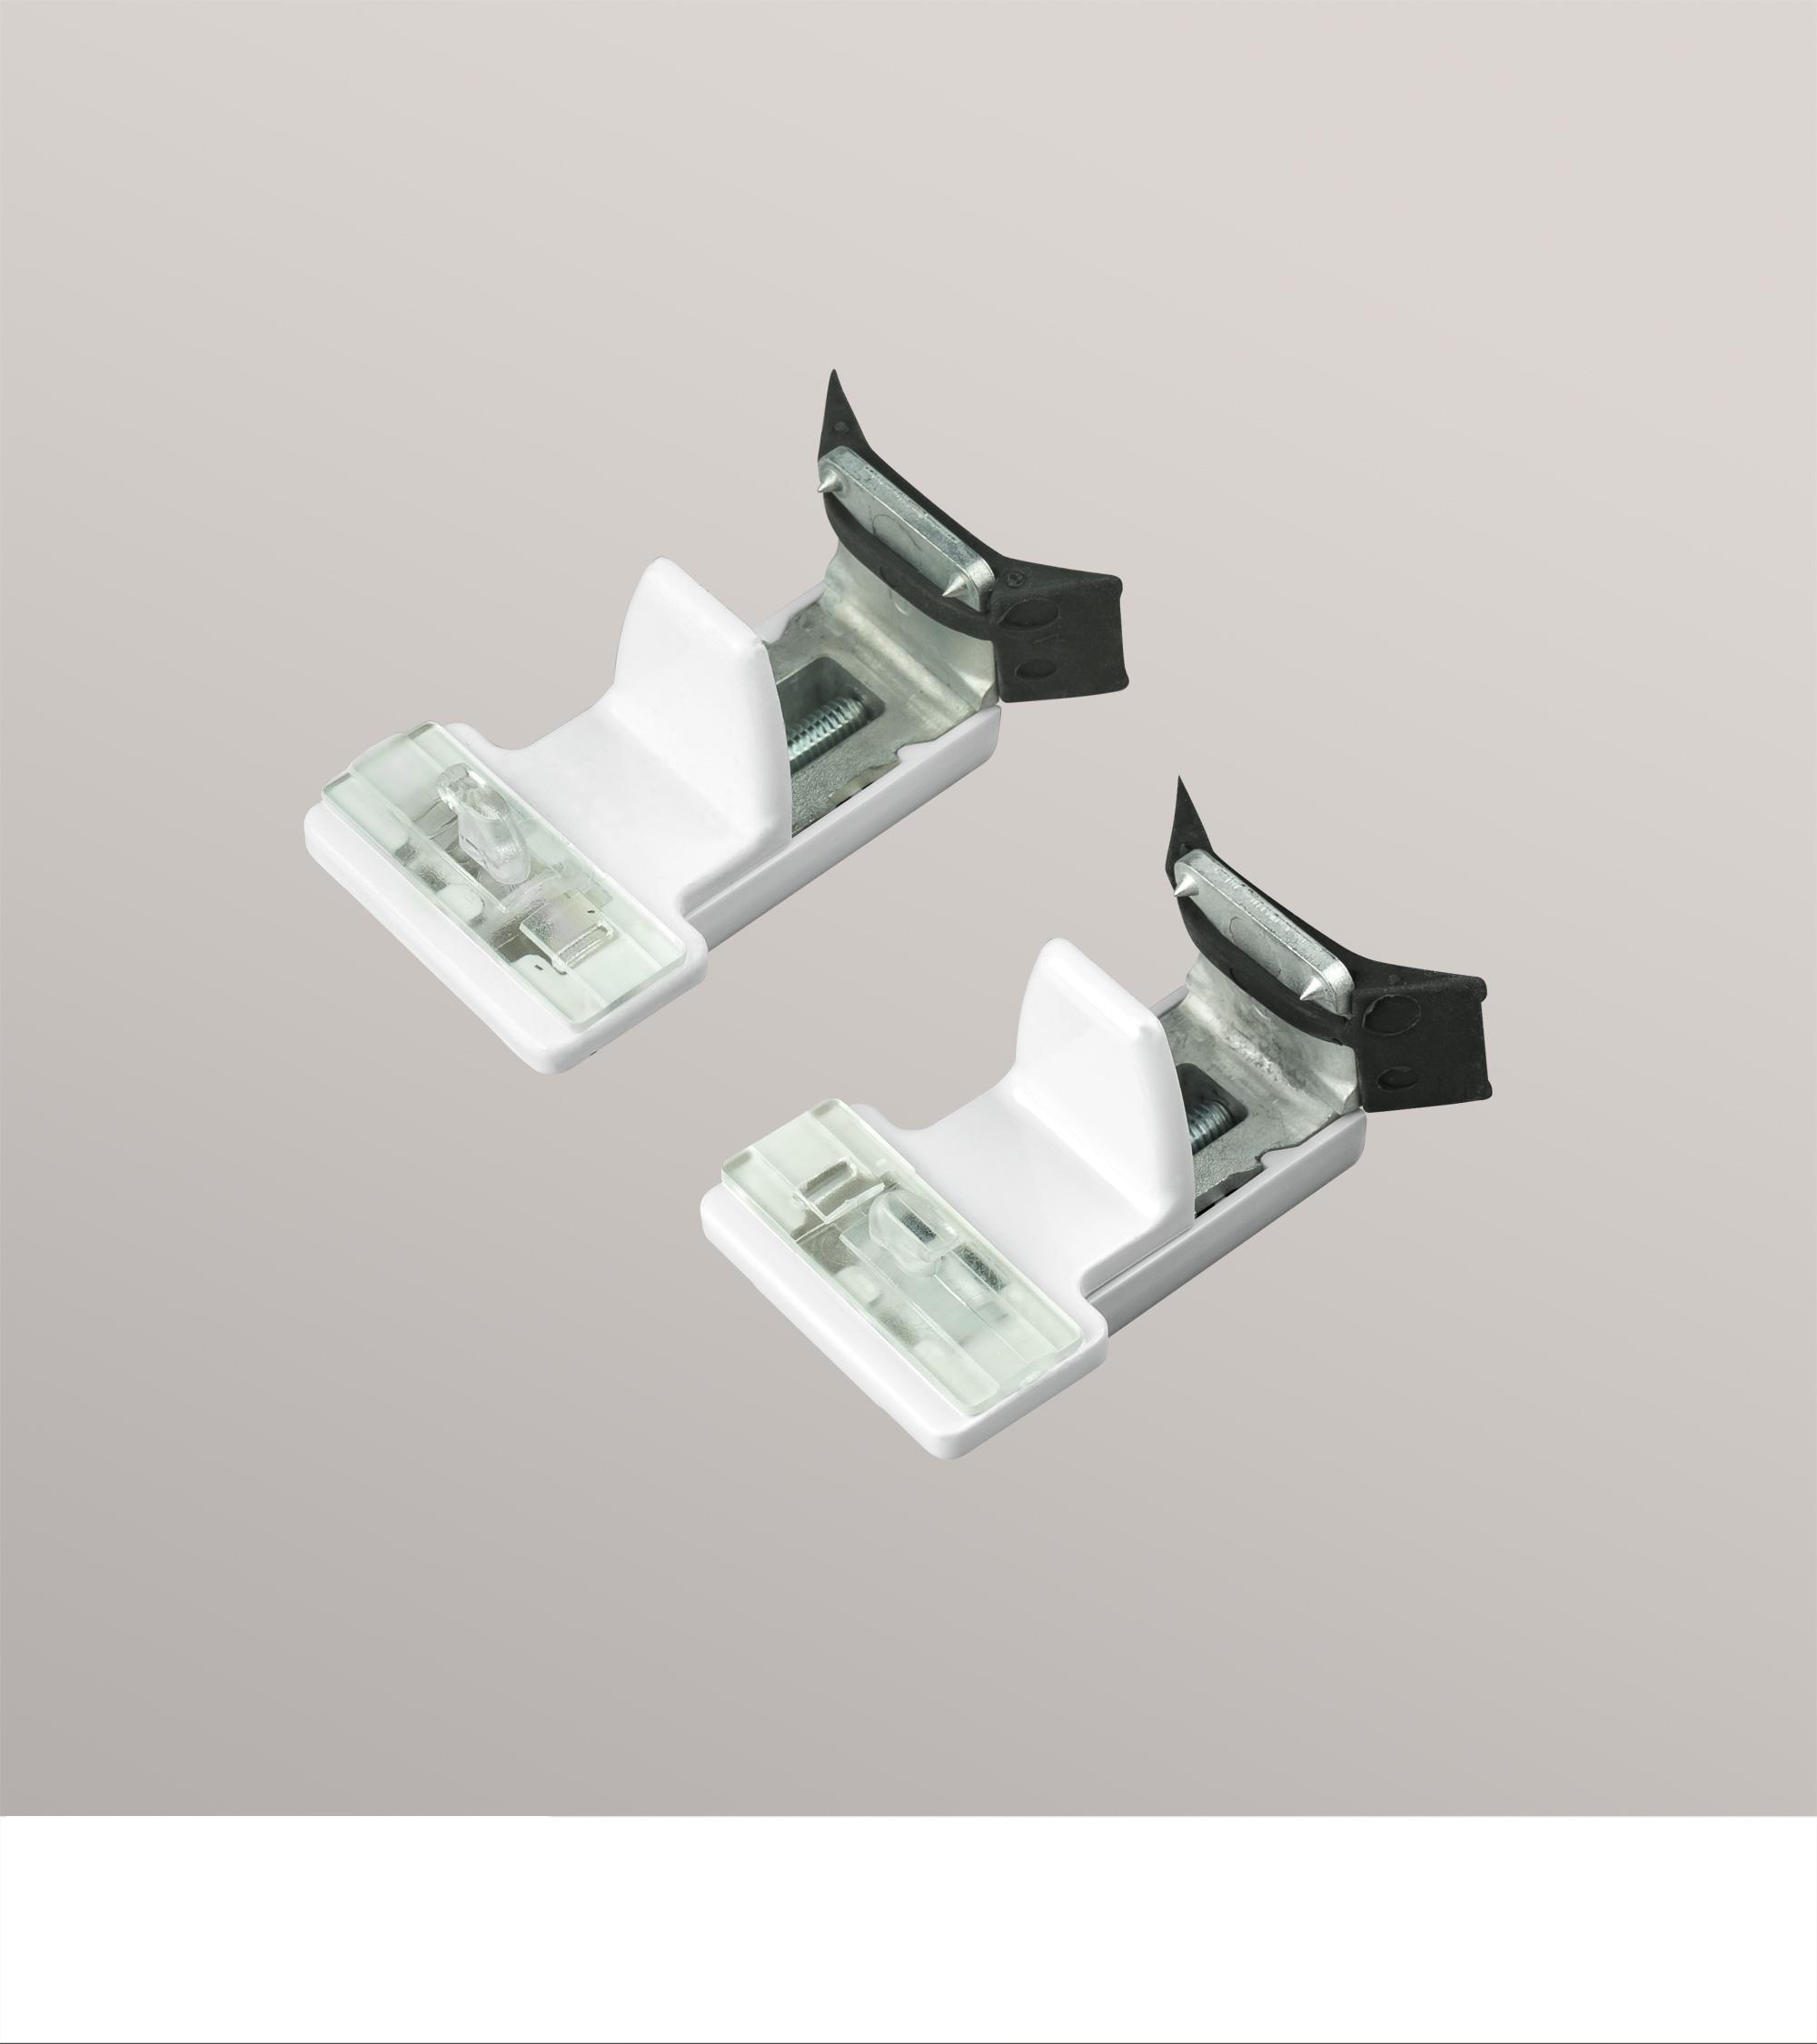 1 paar klemmtr ger exklusiv cosiflor zur befestigung ihres cosiflor plissees. Black Bedroom Furniture Sets. Home Design Ideas